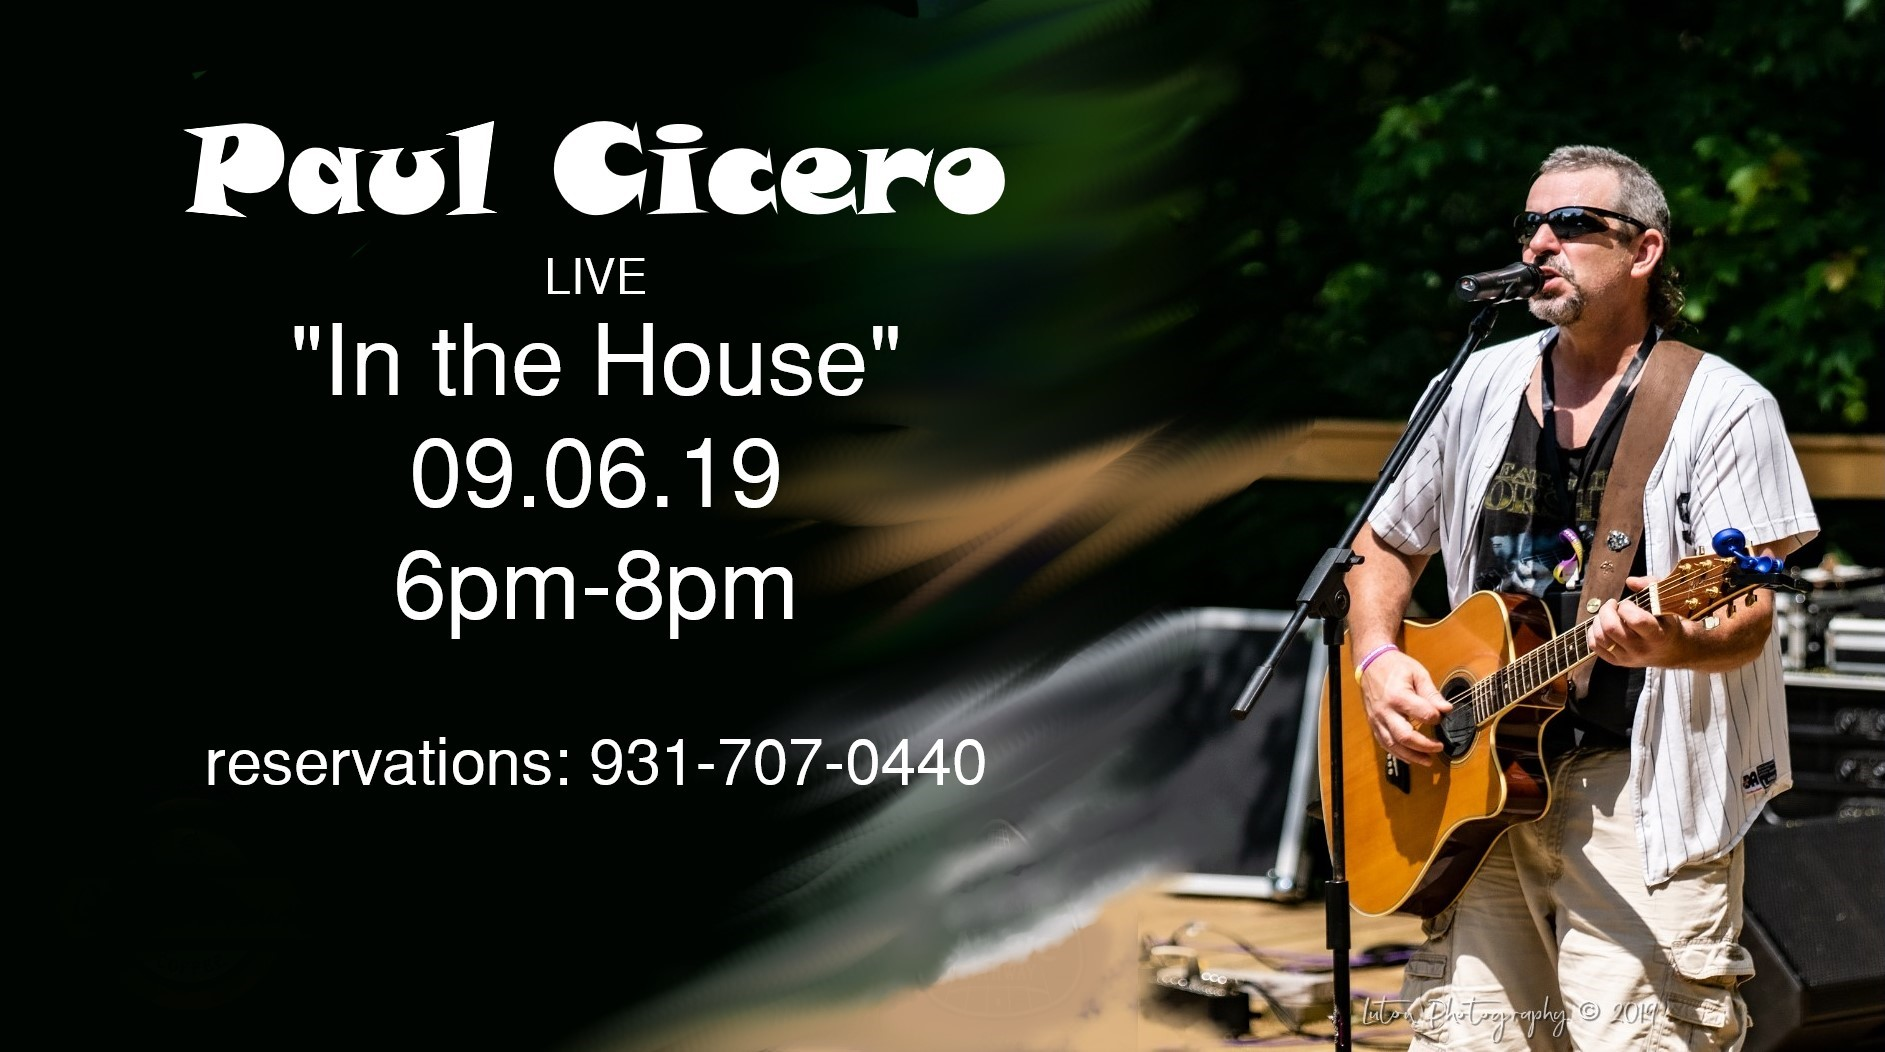 Paul Cicero 09-06-19 FB Final-2.jpg